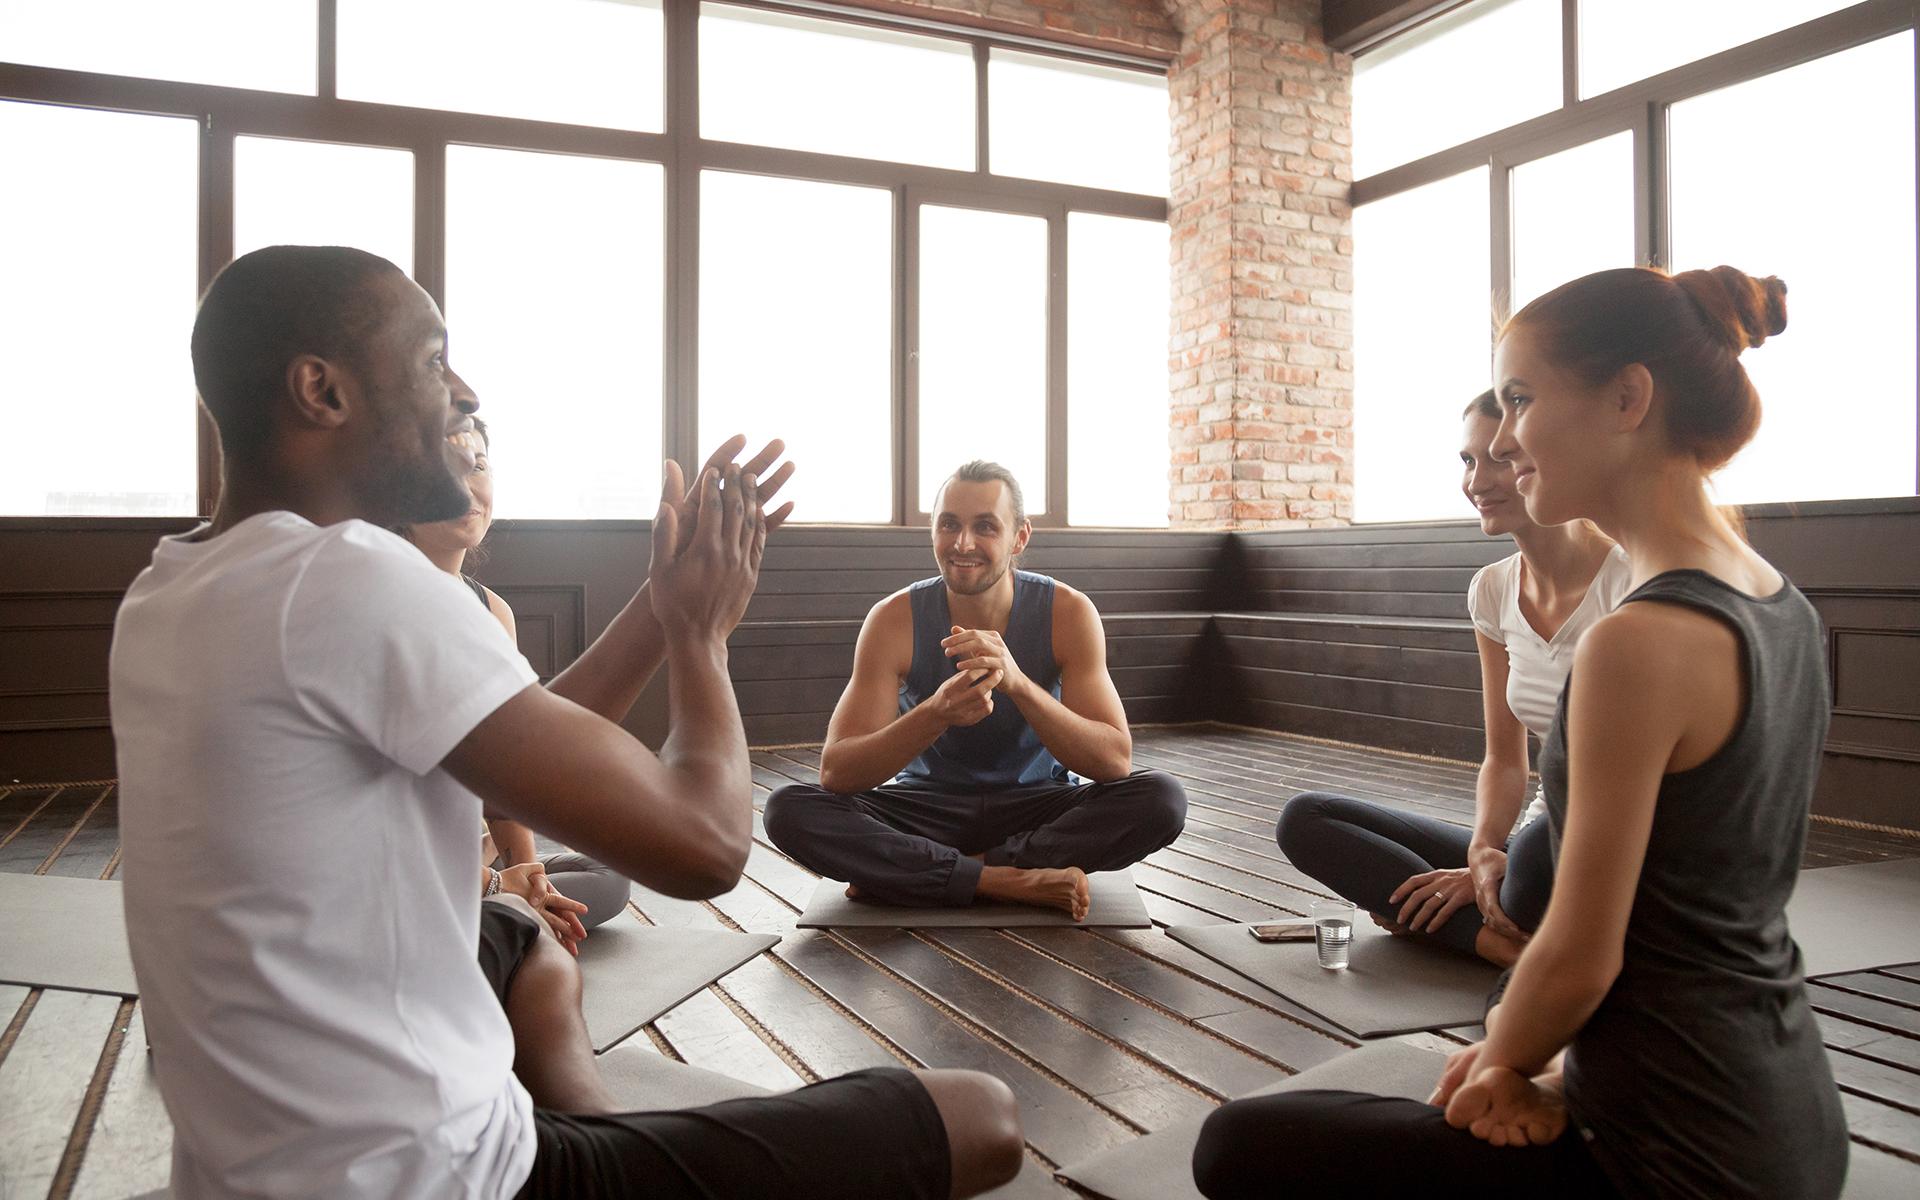 meditation teacher talking to students